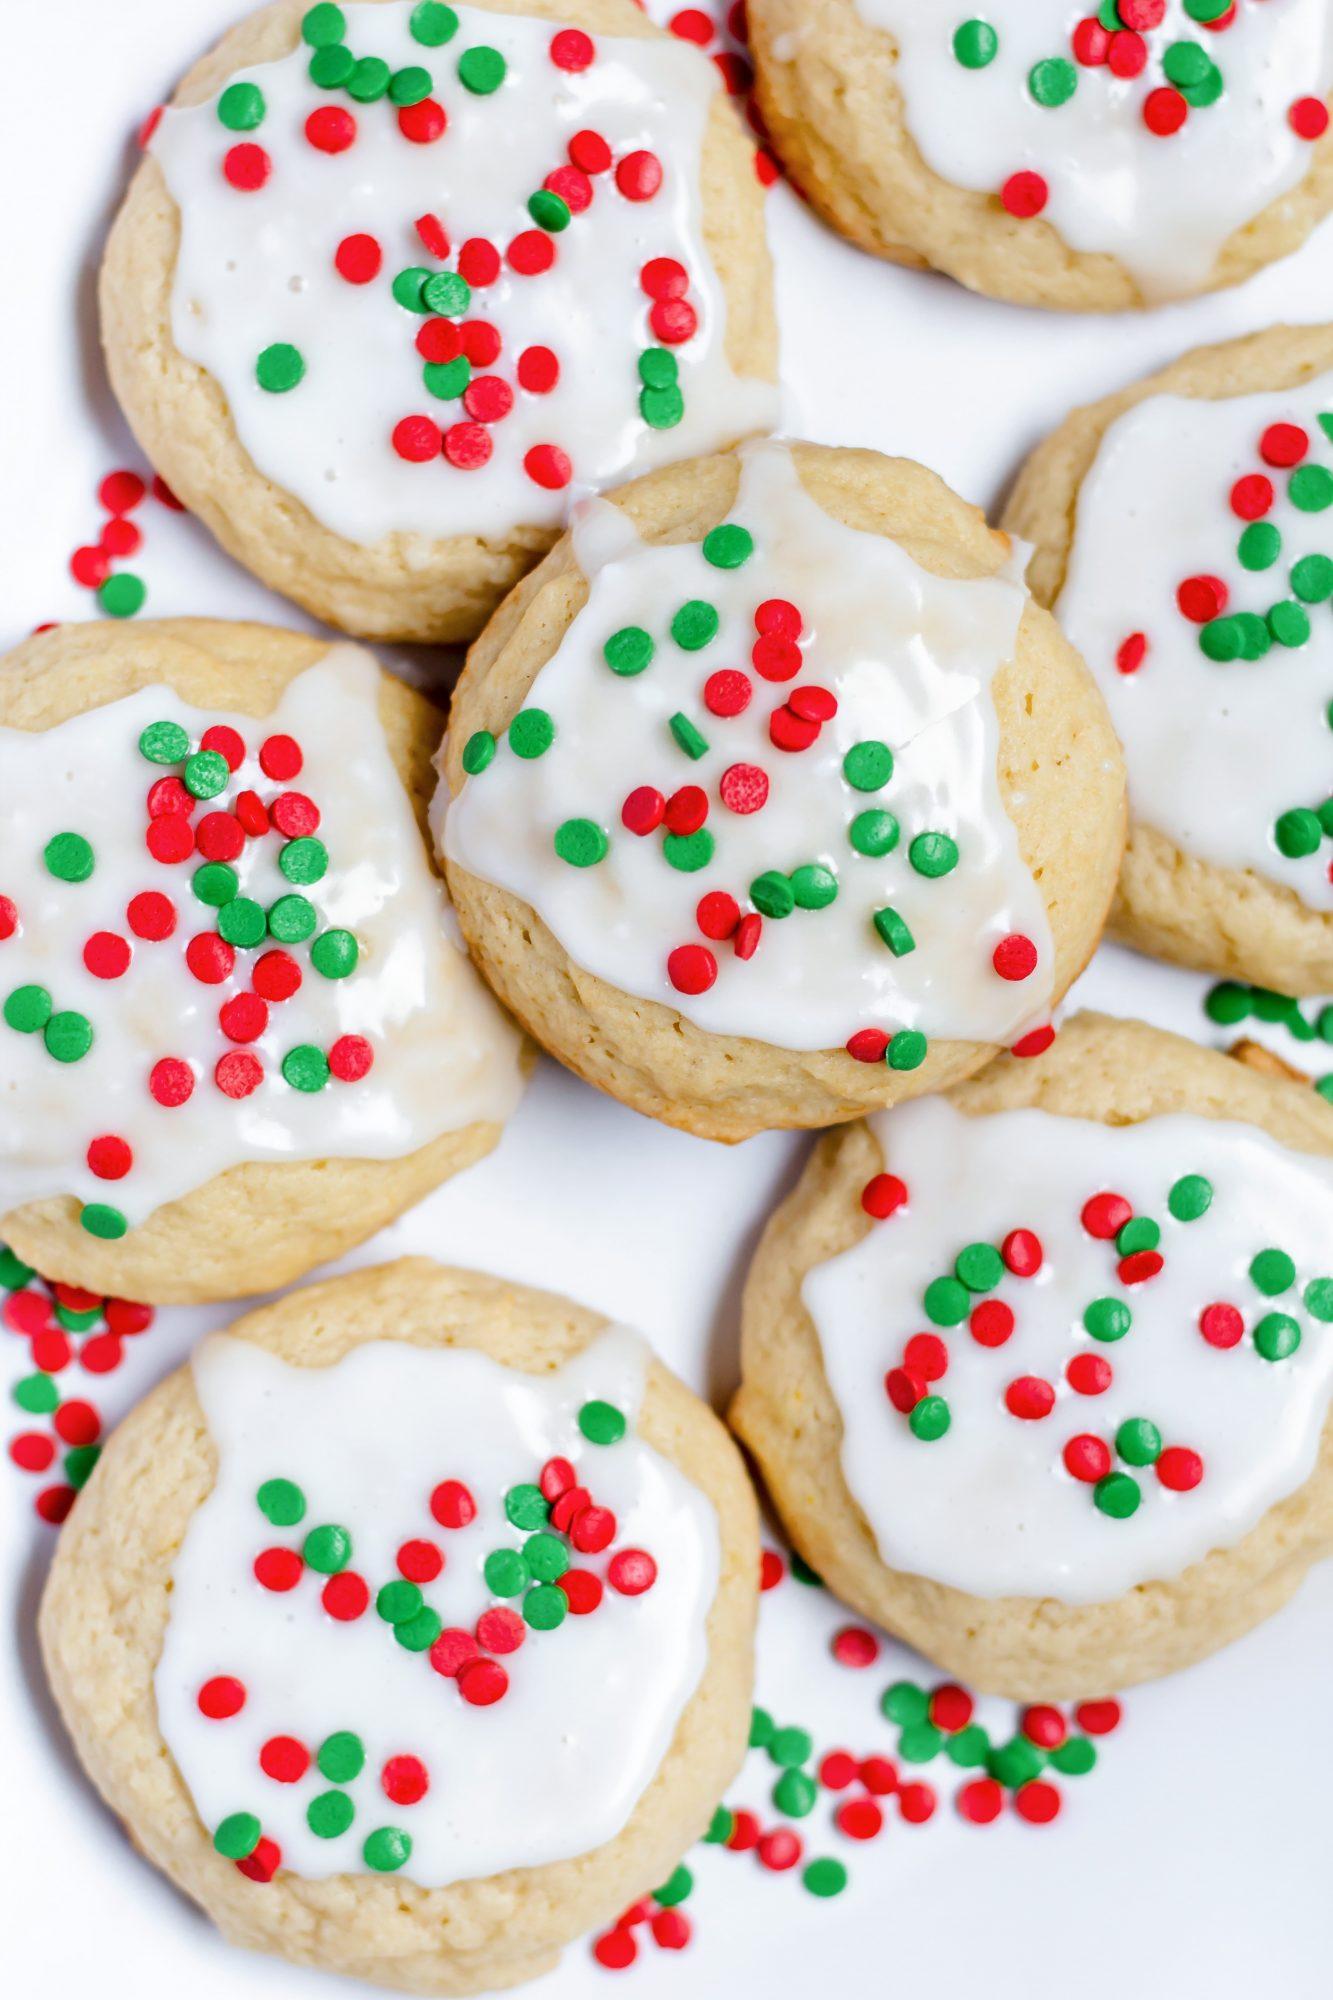 sour cream cookies with lemon glaze